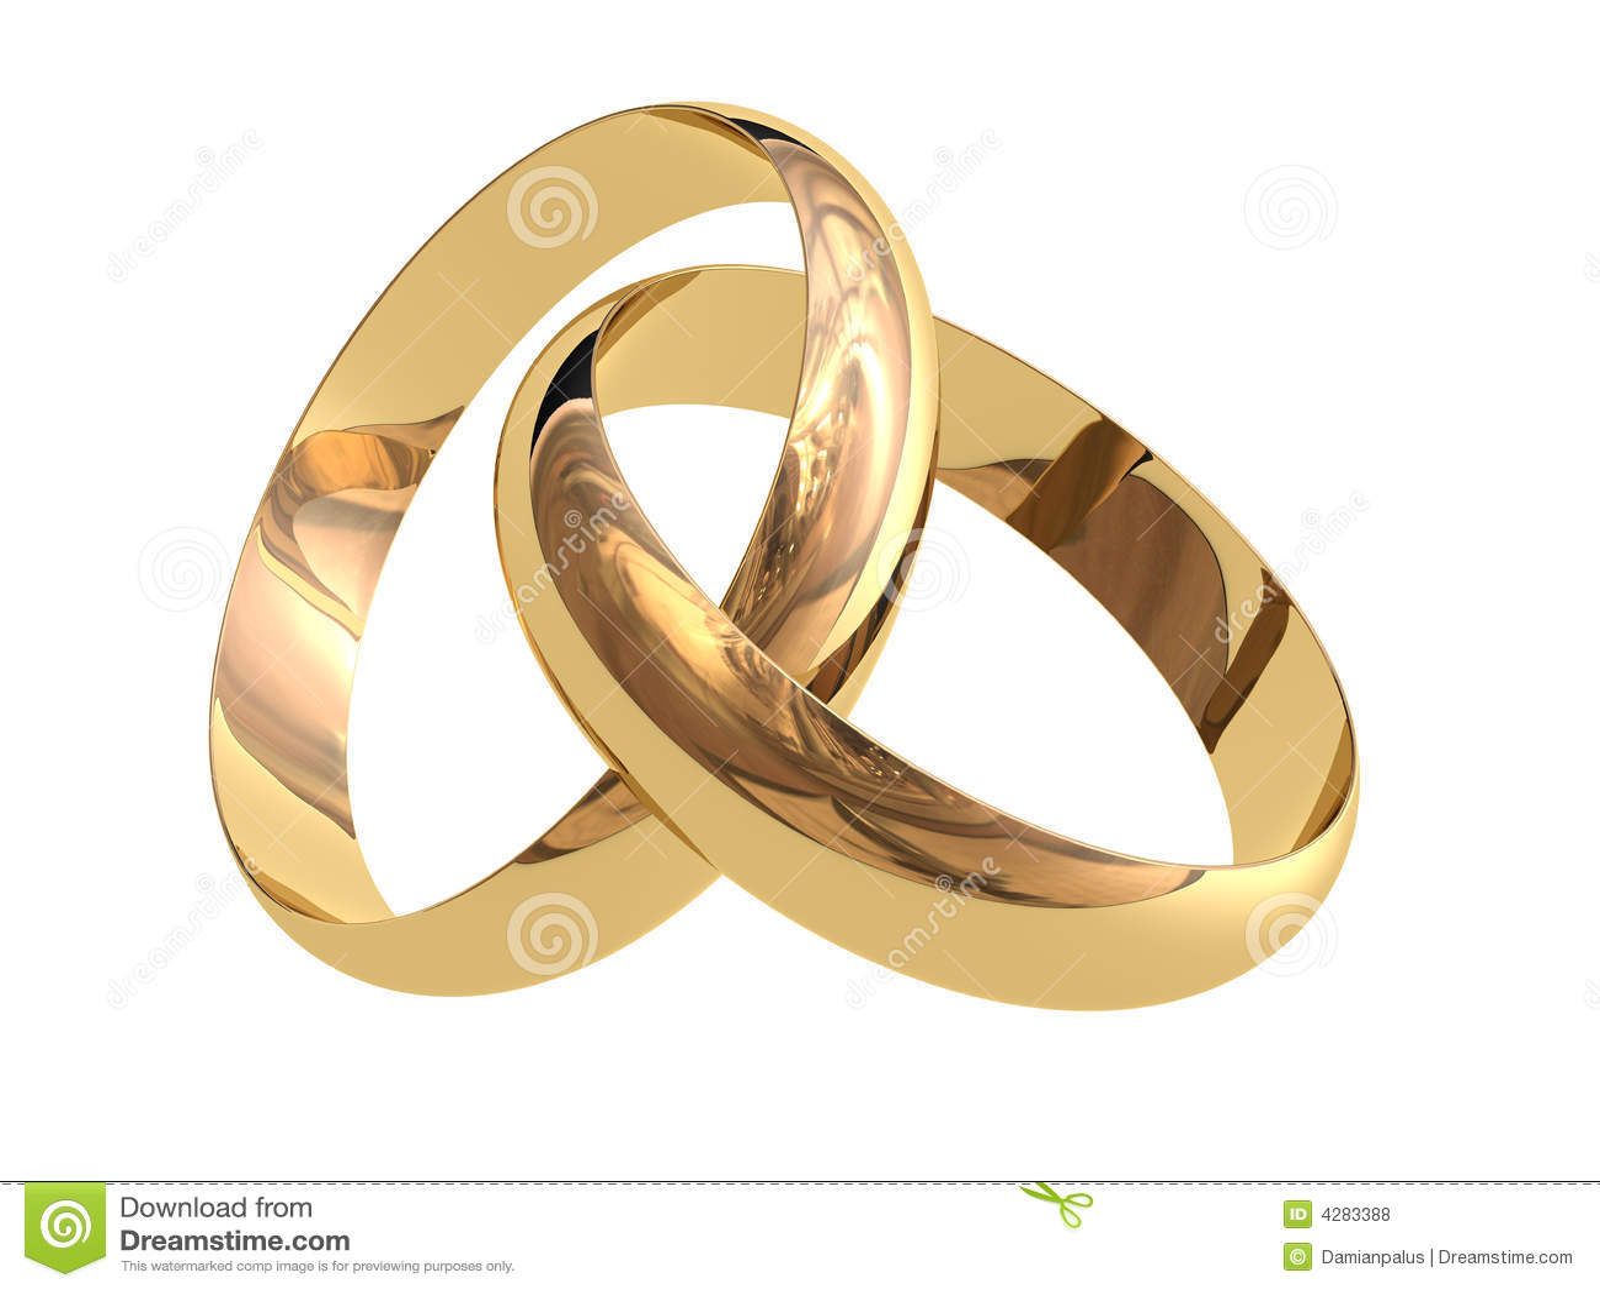 wedding rings royalty free stock photos image 4283388